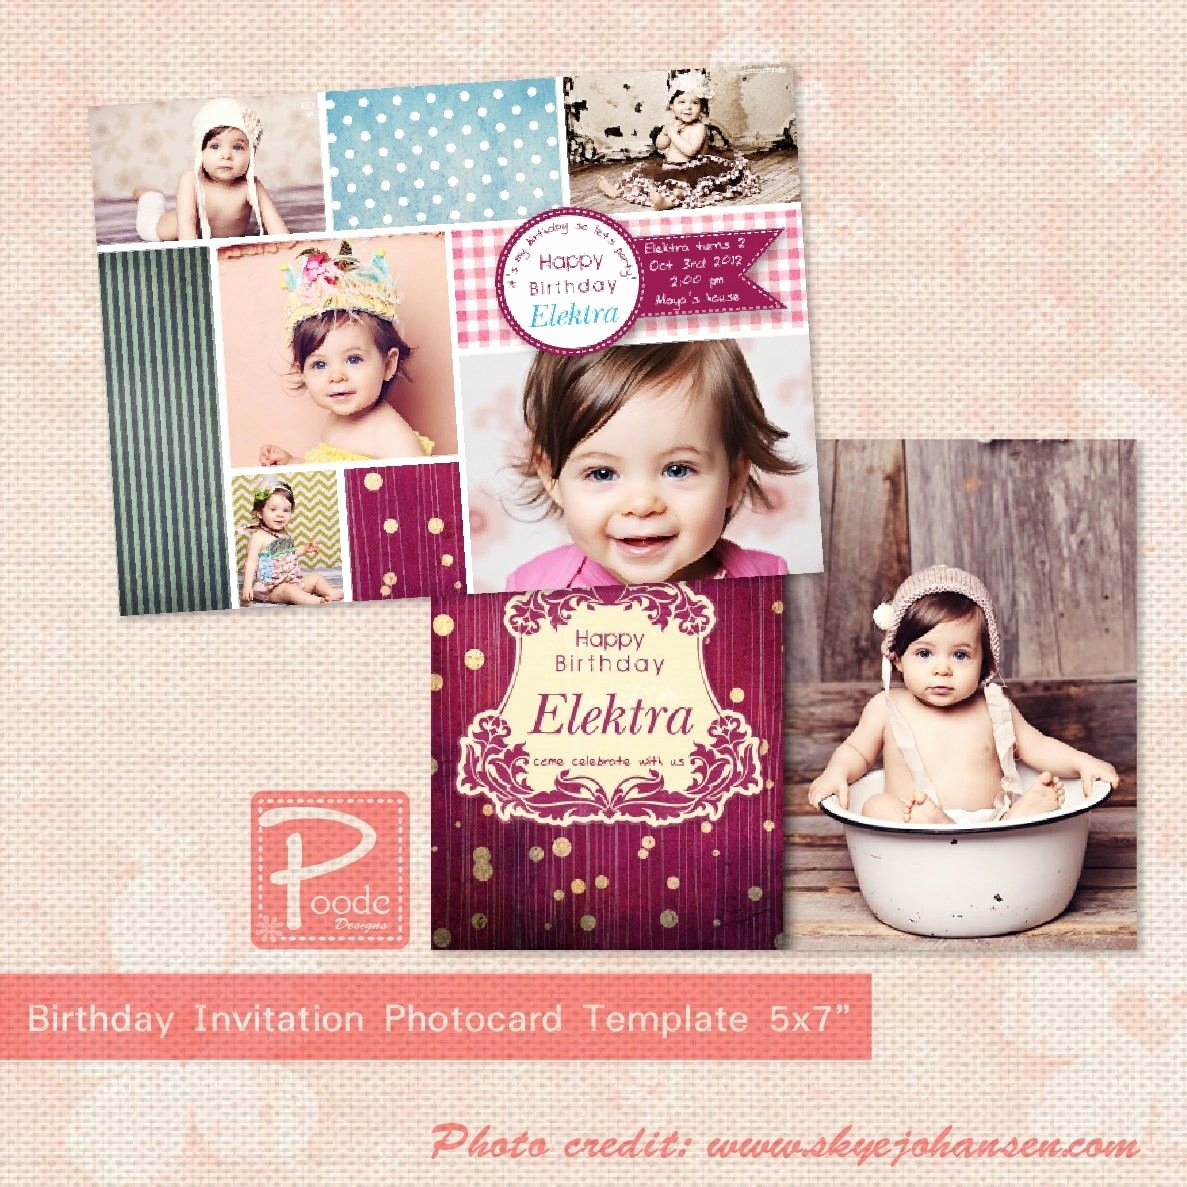 Birthday Invitation Template Photoshop Lovely Invitation Templates Psd Free